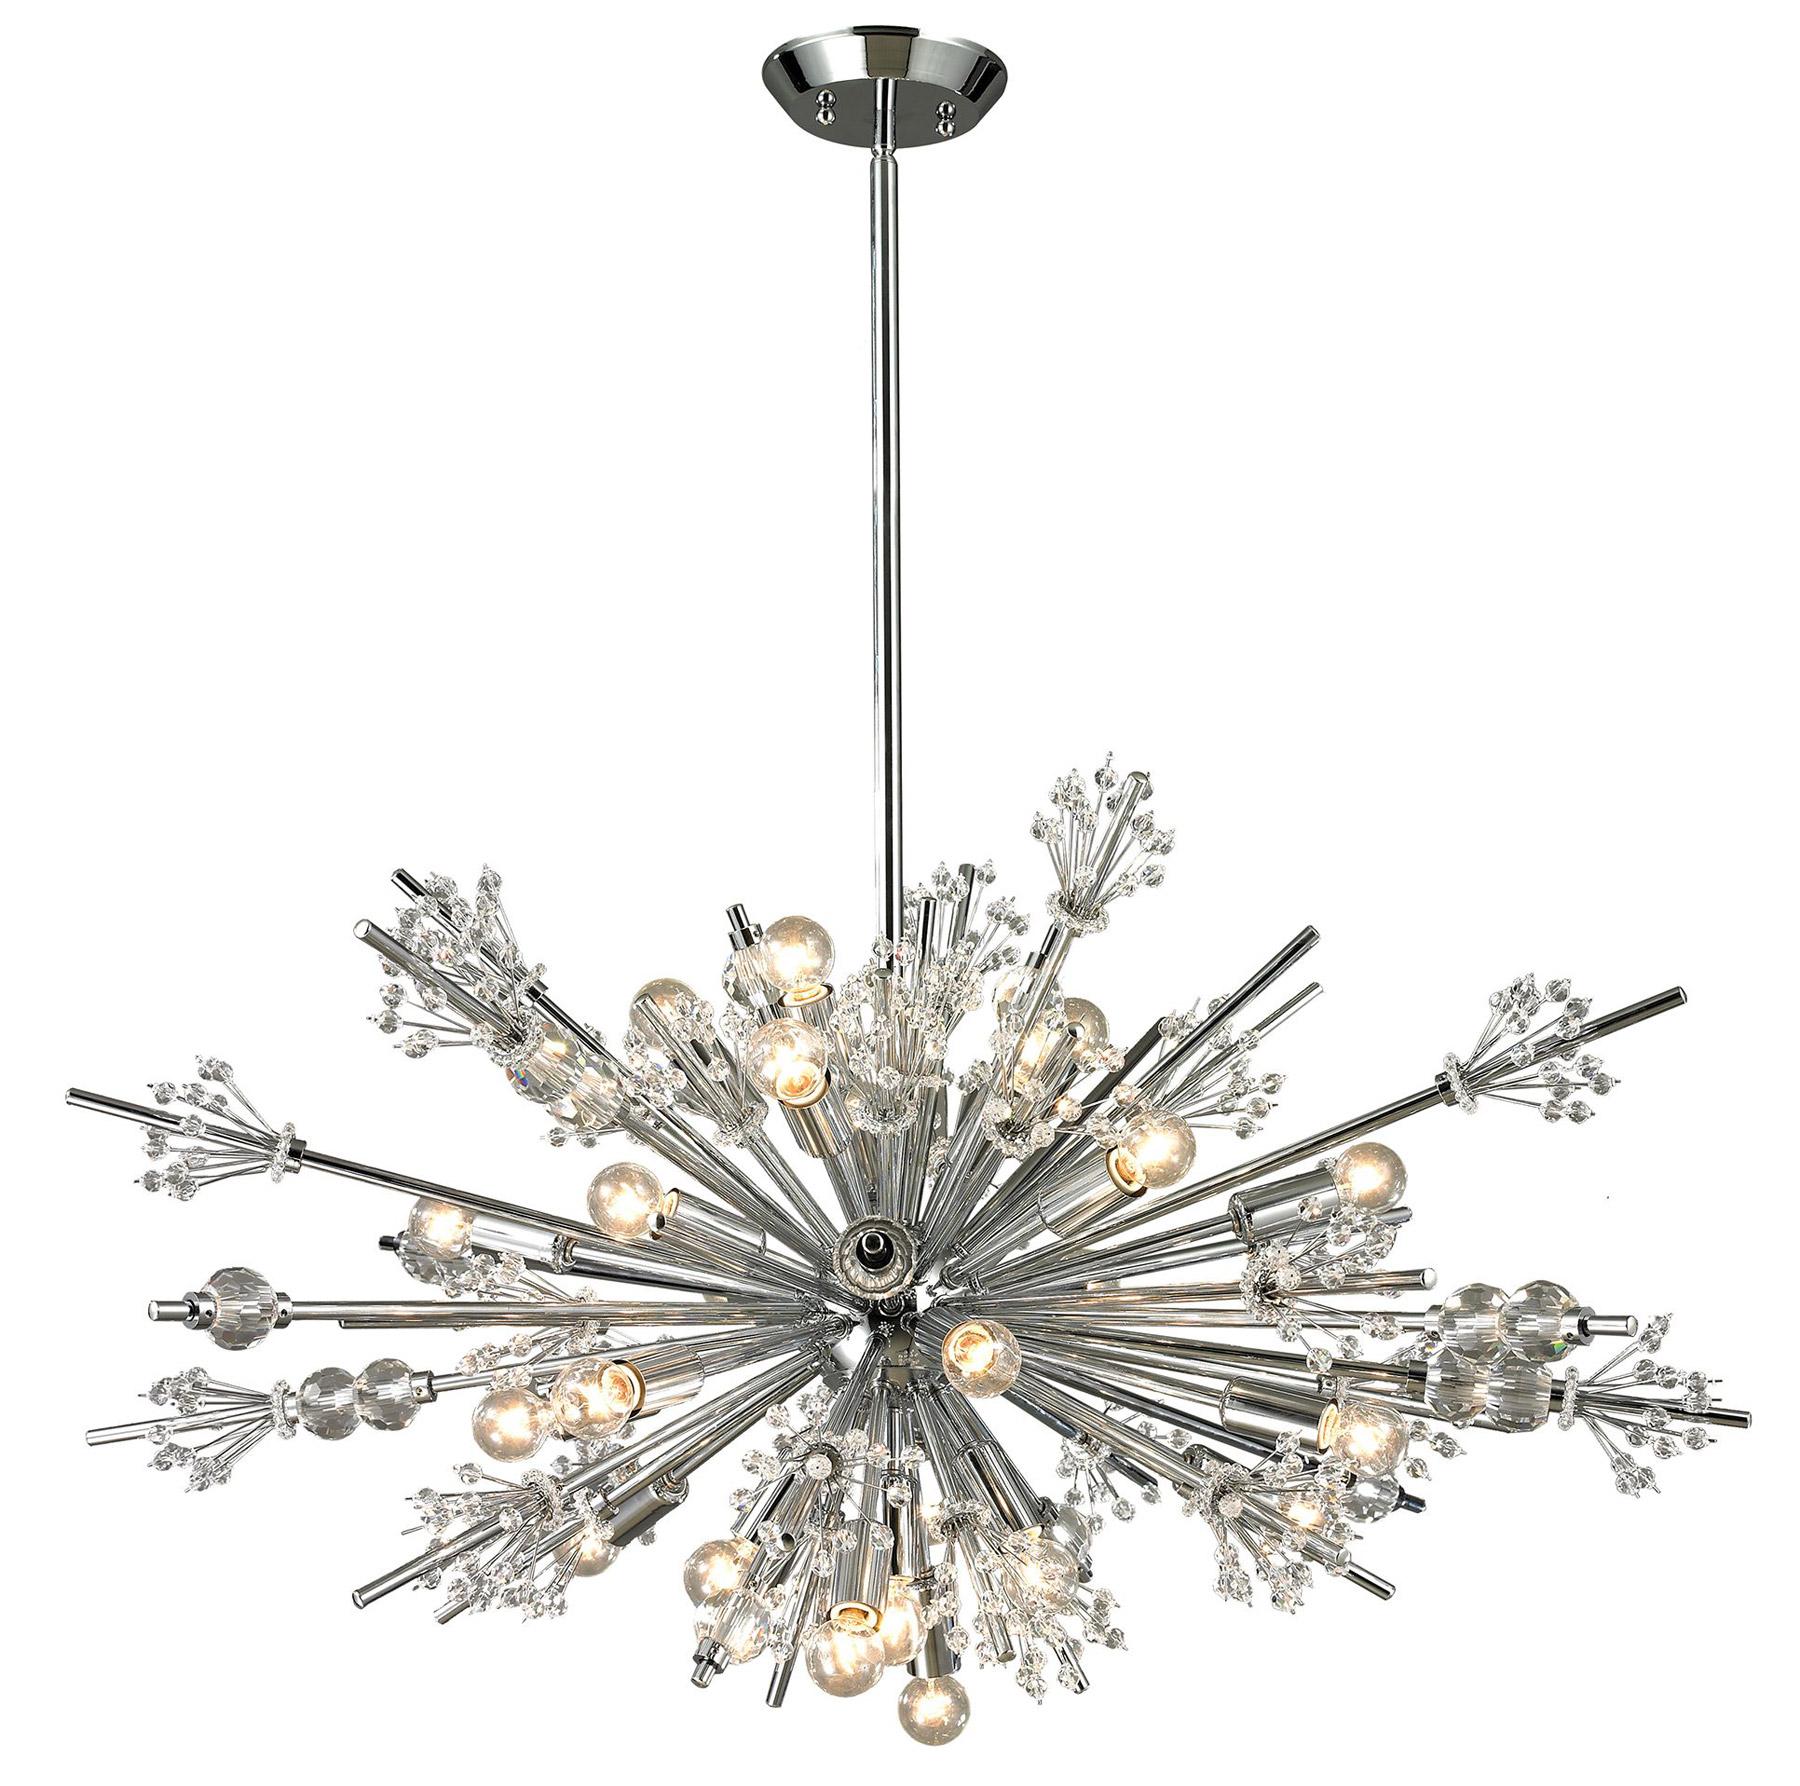 Elk Lighting 11752 24 Starburst 24 Light Chandelier